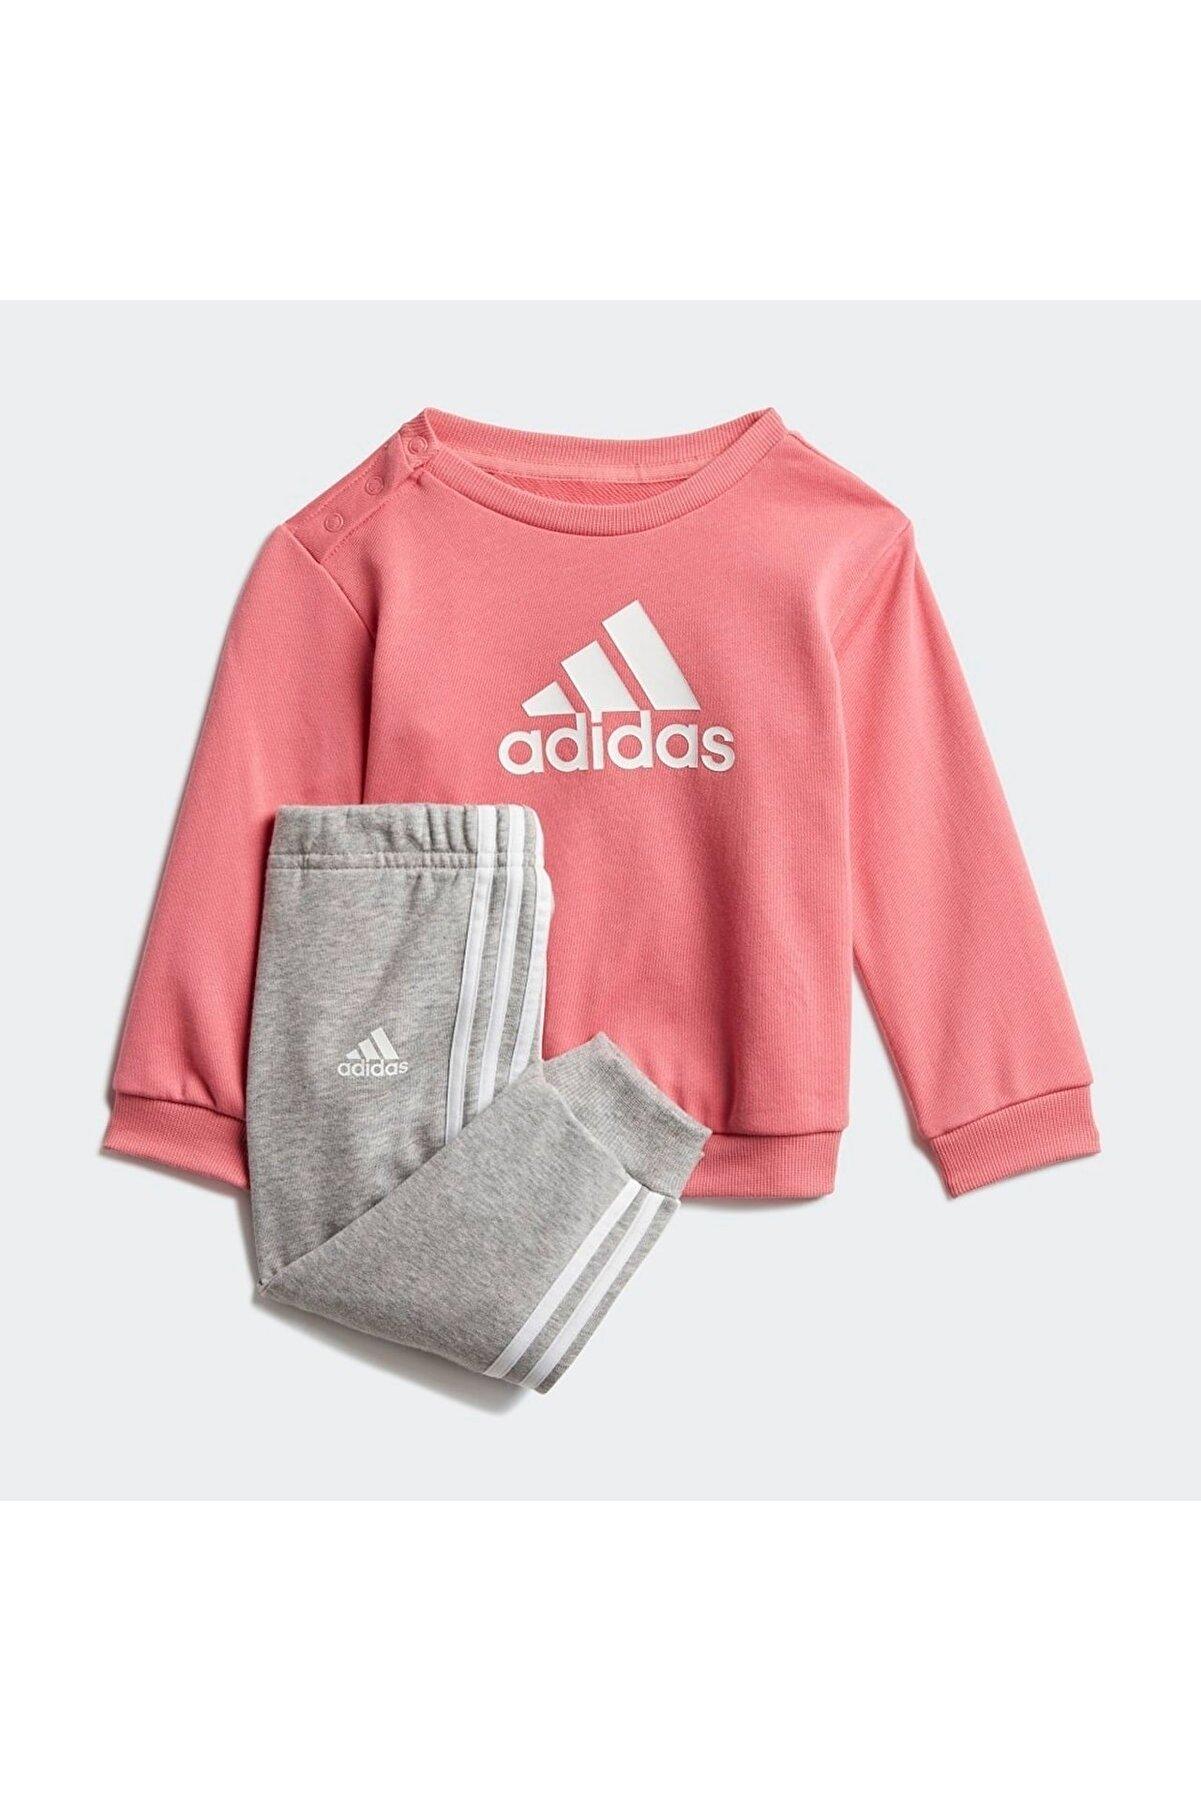 adidas Kız Çocuk Gri I Bos Jog Ft Eşofman Takımı